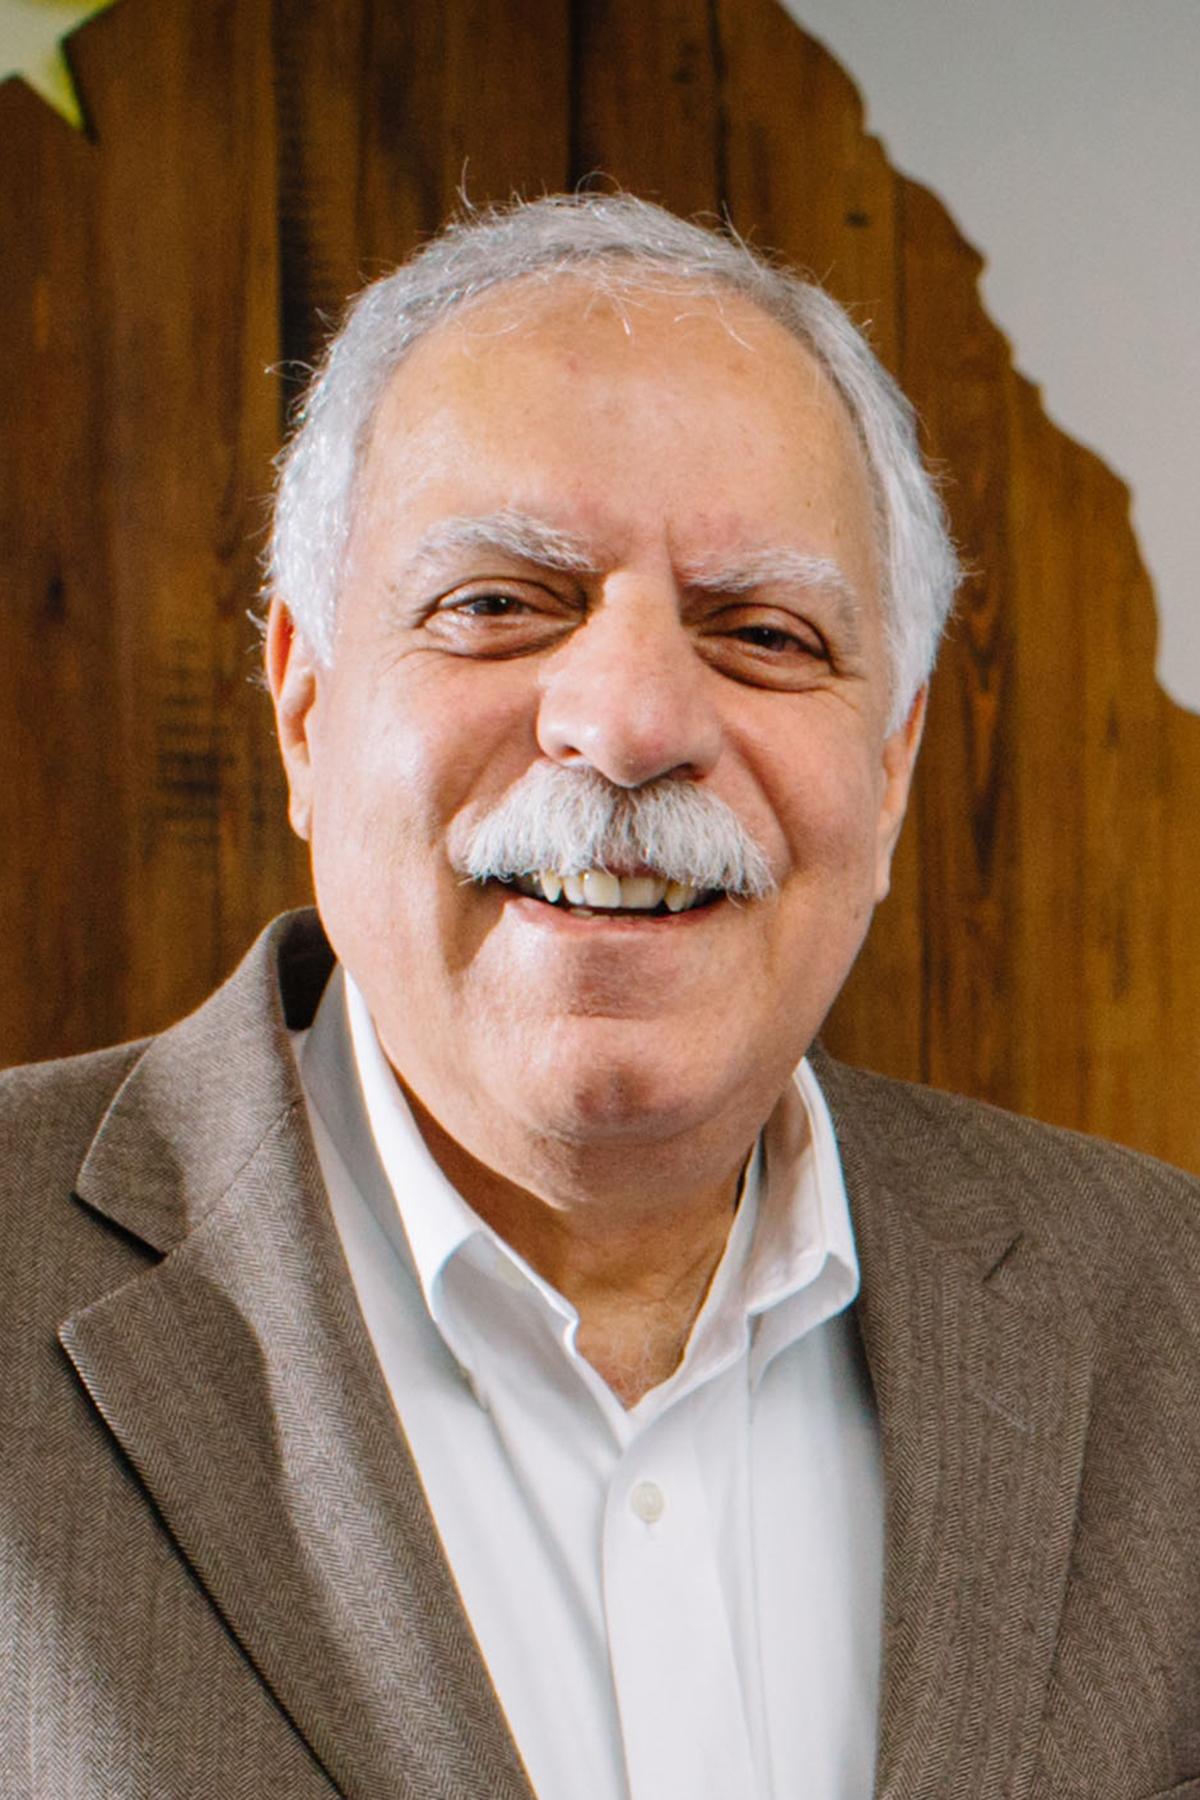 Robert Kazanjian, PhD , Senior Associate Dean for Strategic Initiatives, Goizueta Business School, Emory University